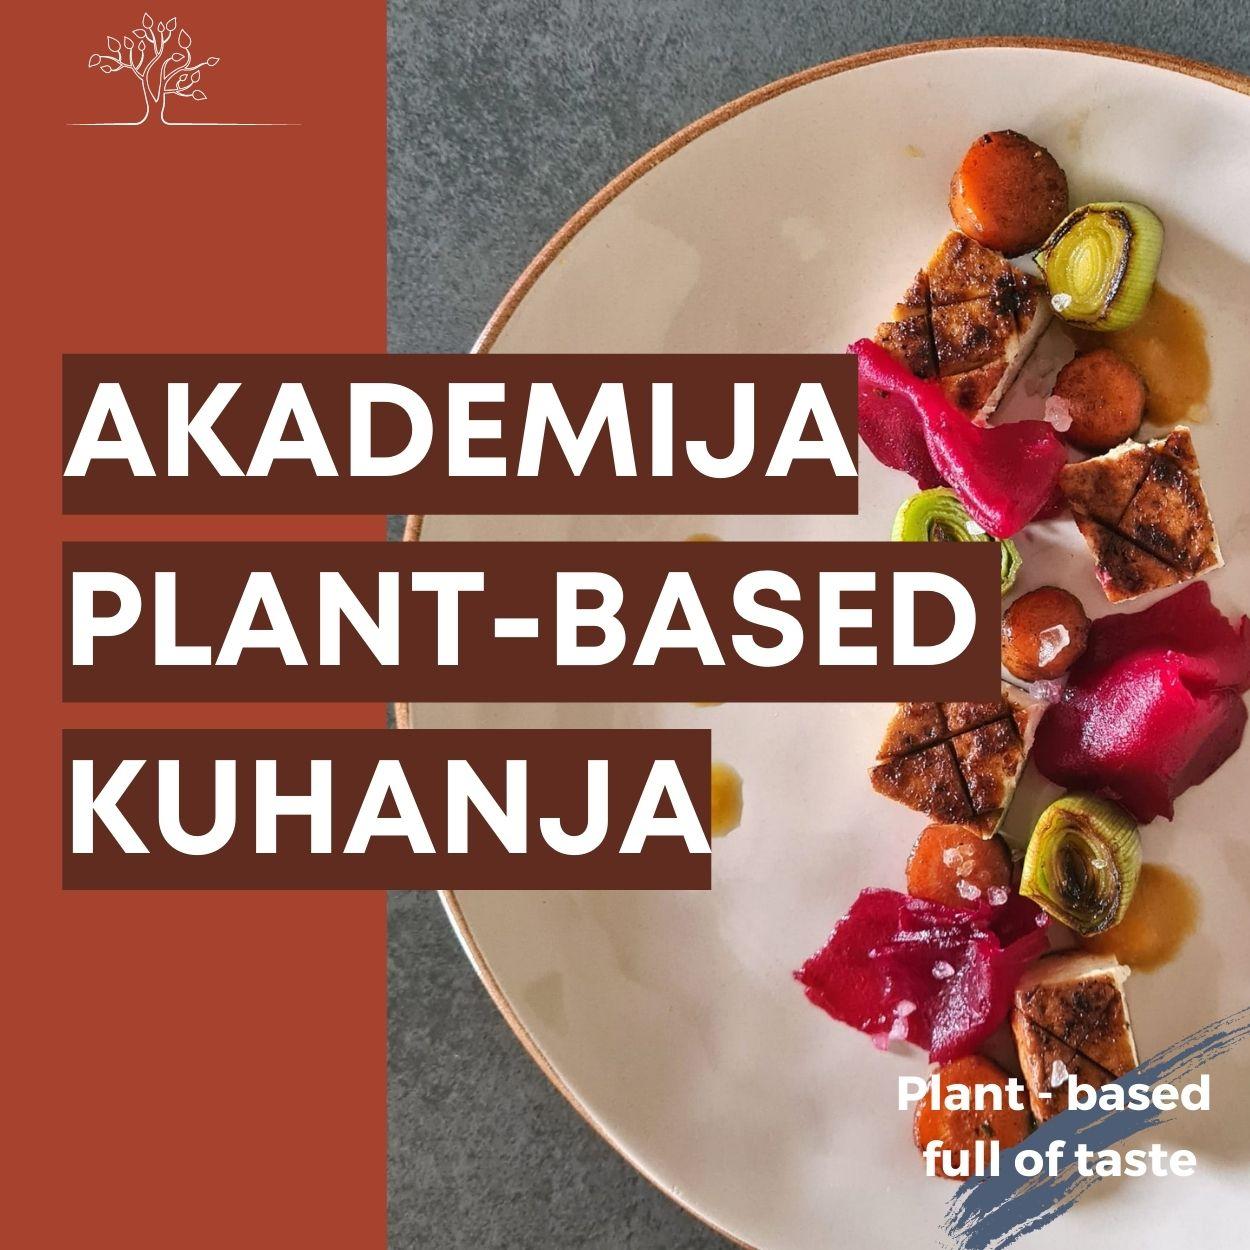 Akademija plant-based kuhanja-Enzita kitchen studio